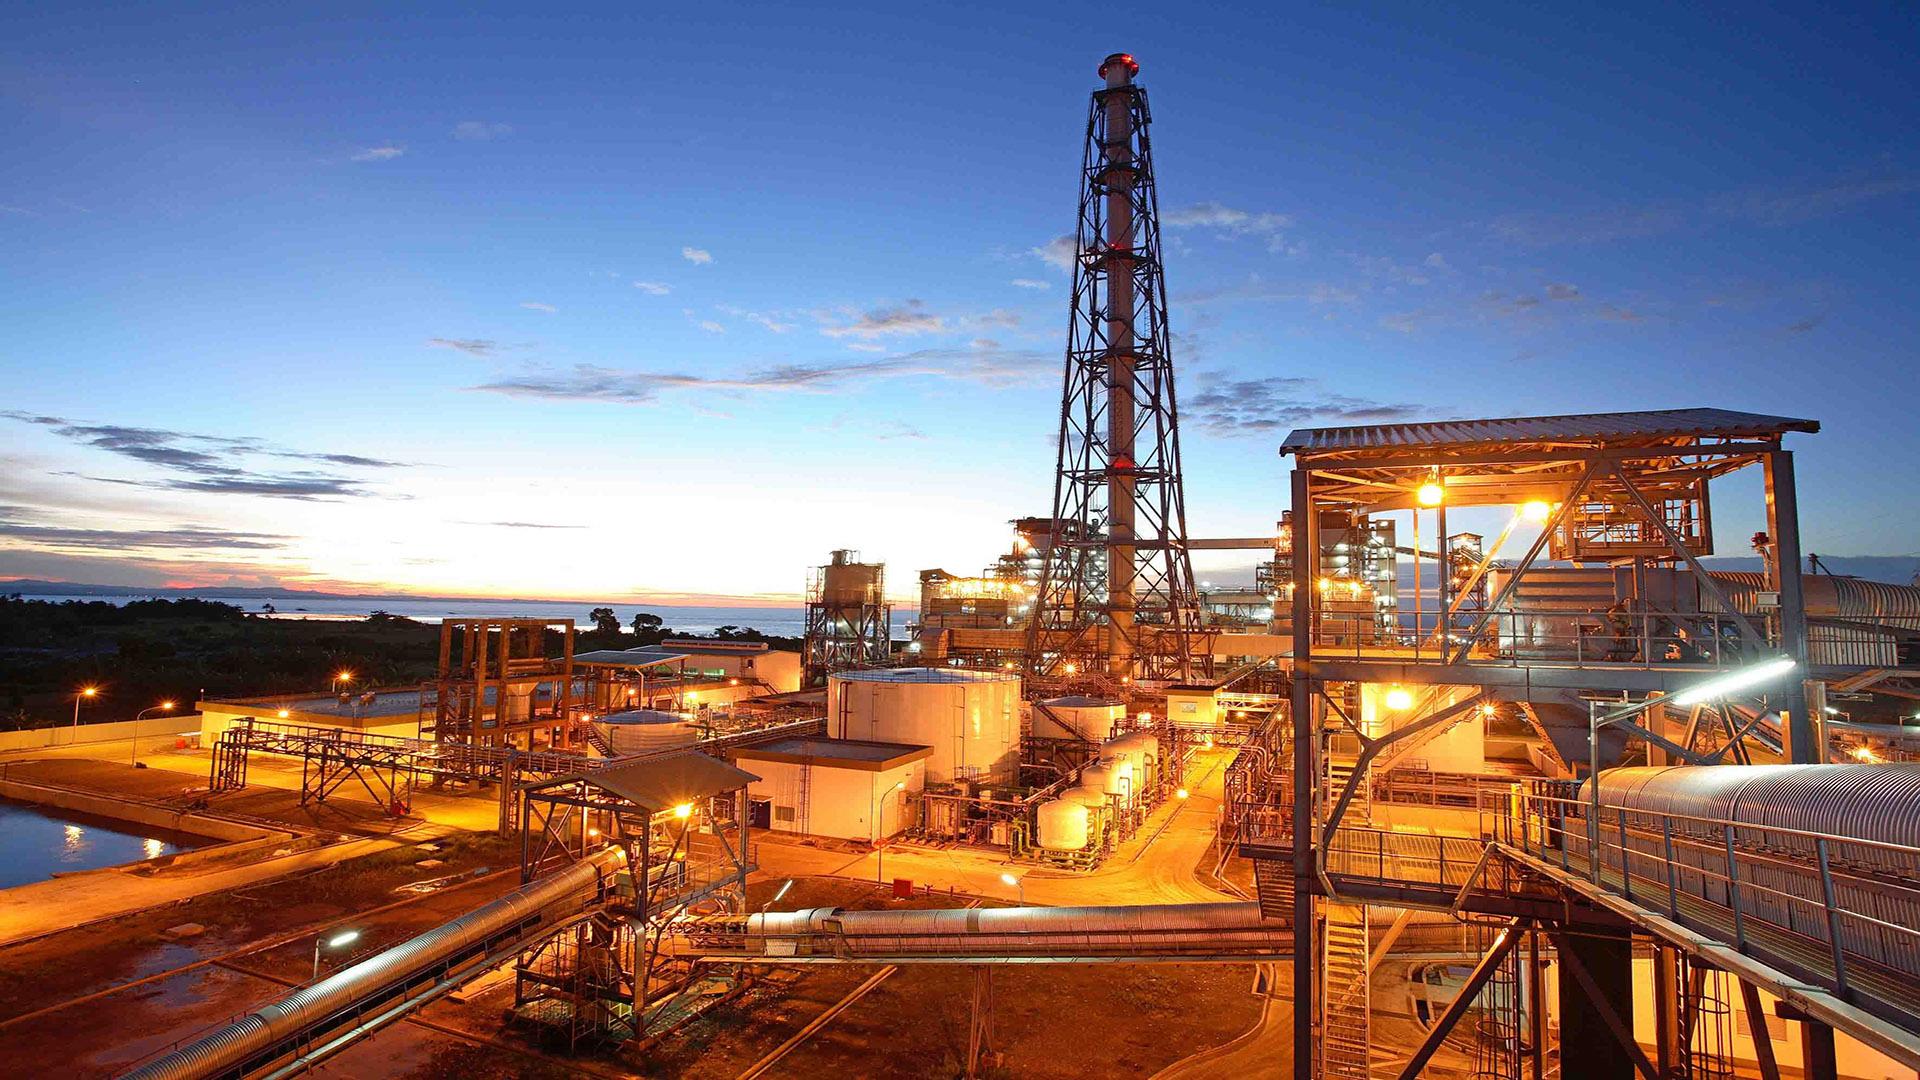 Промпроизводство в Казахстане в январе-ноябре сократилось на 0,8%